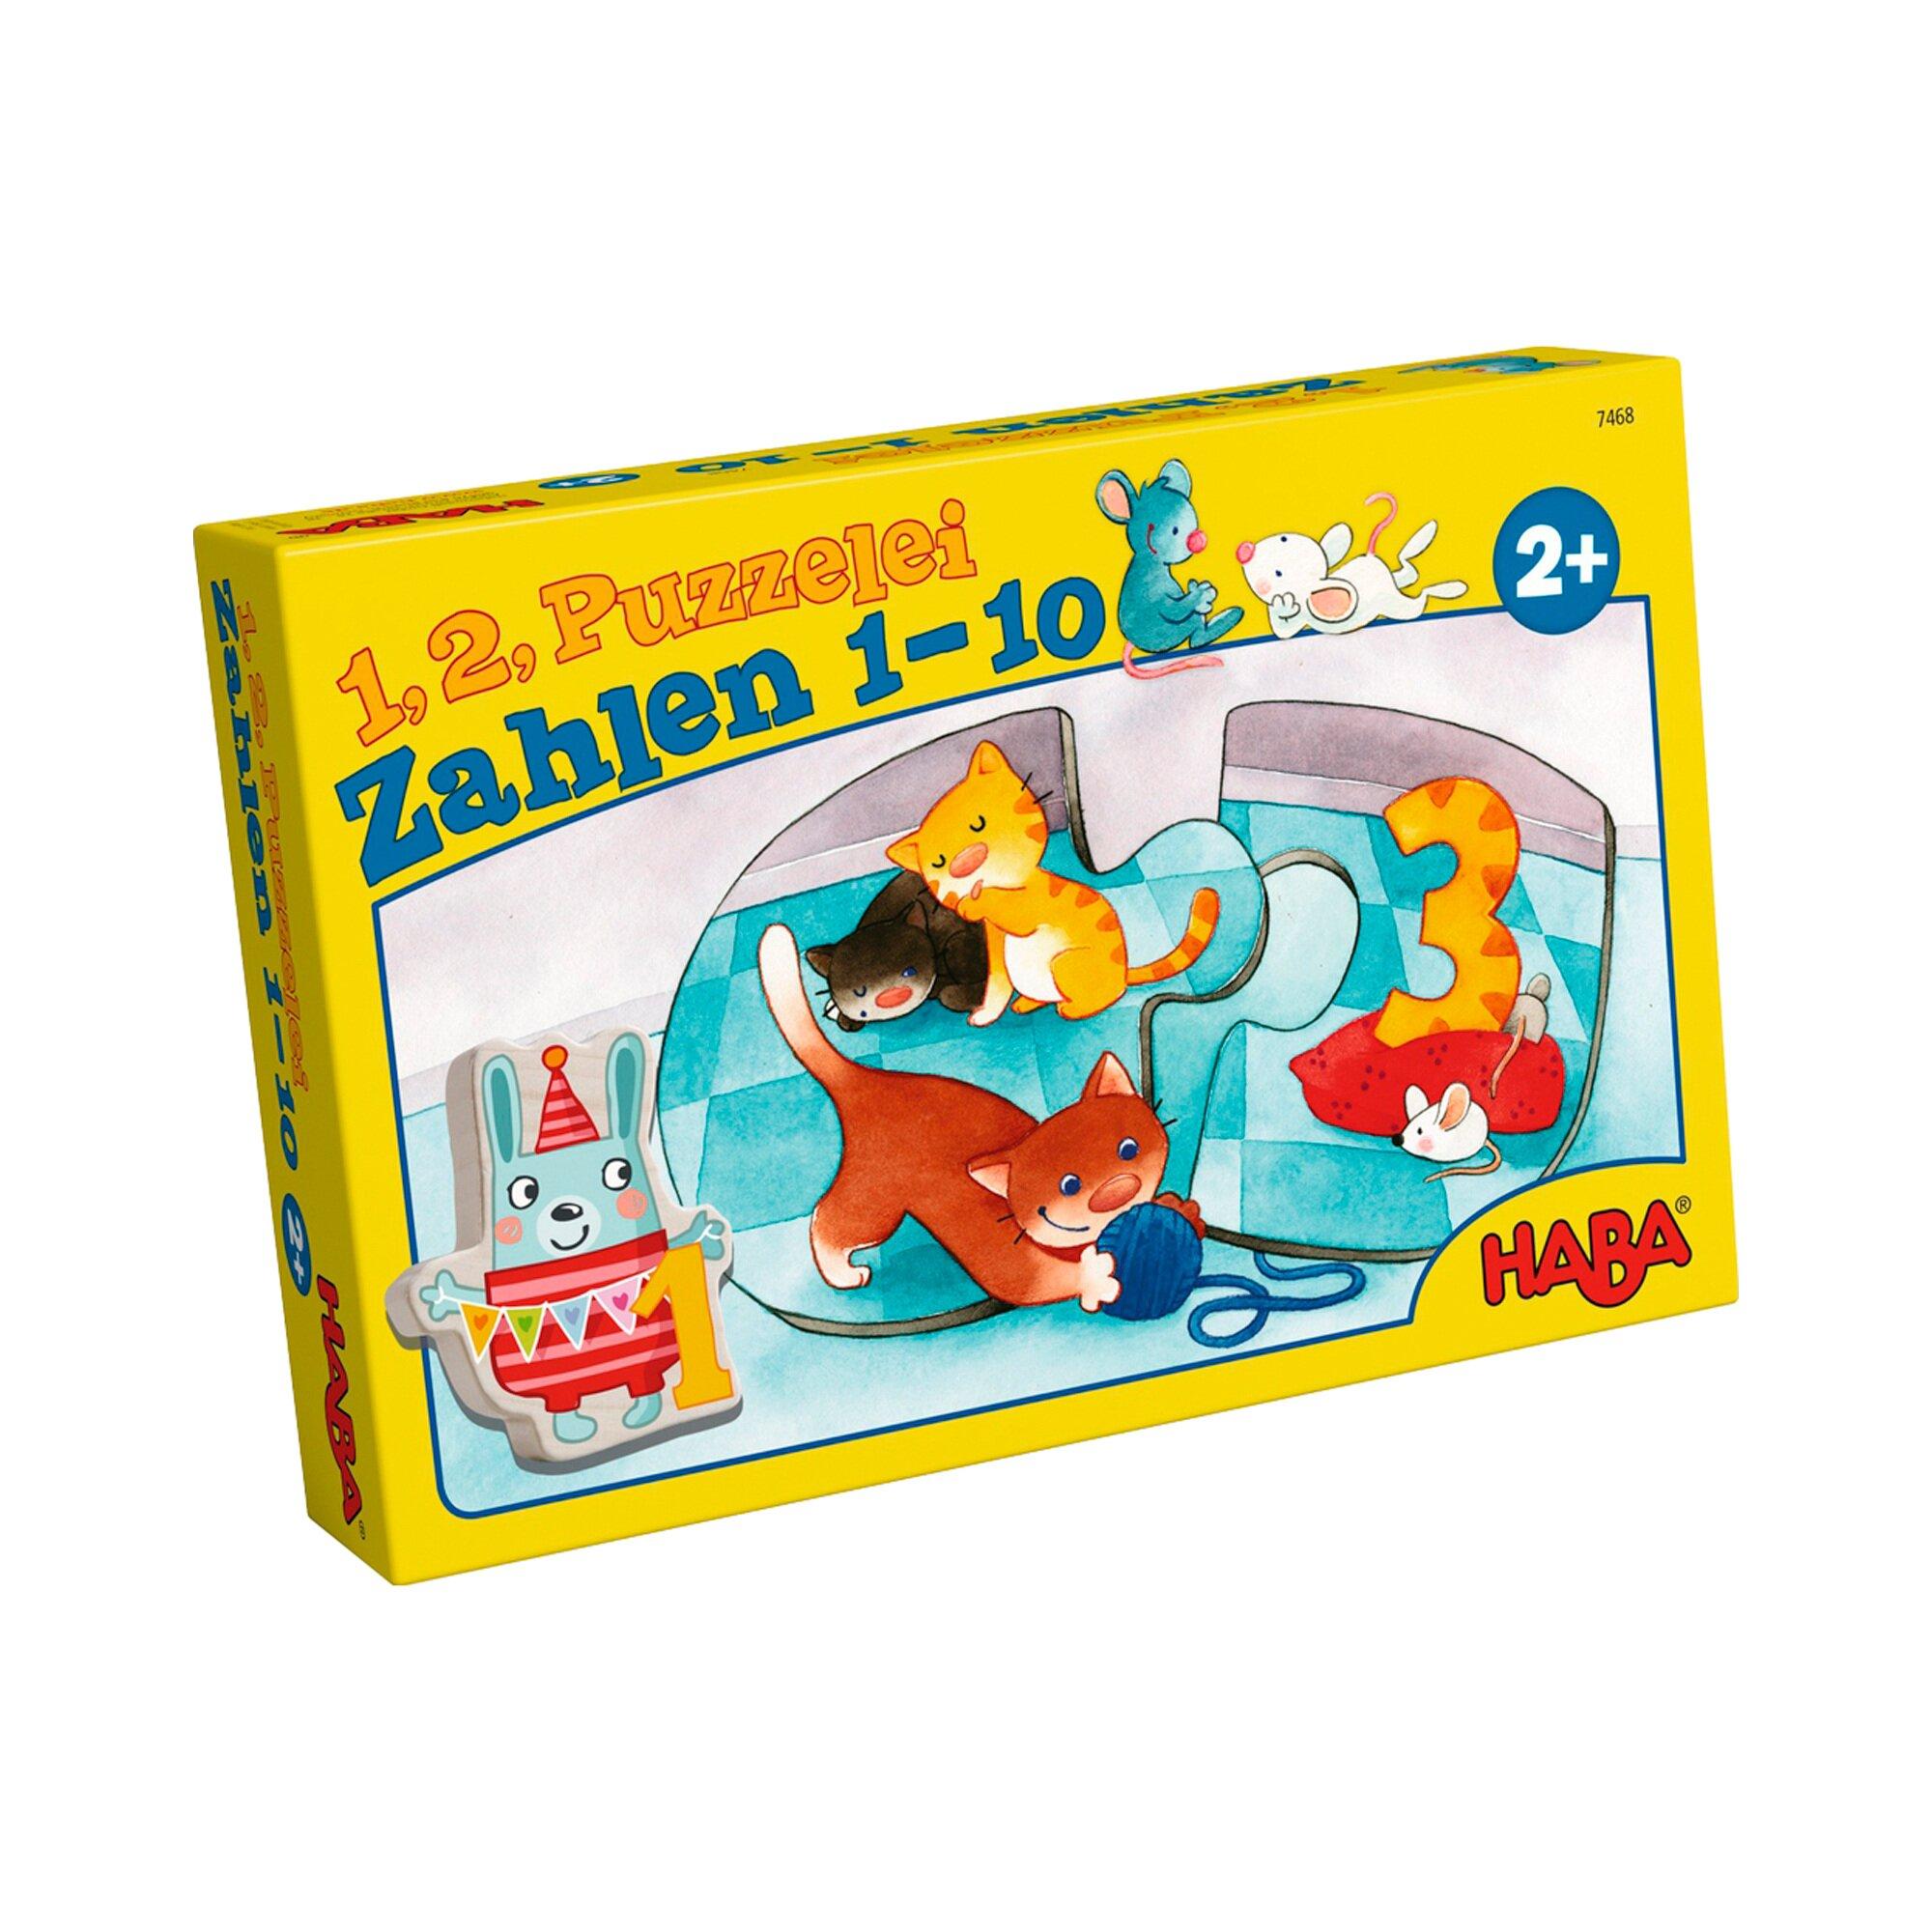 Haba Puzzle - 1, 2, Puzzelei Zahlen 1-10